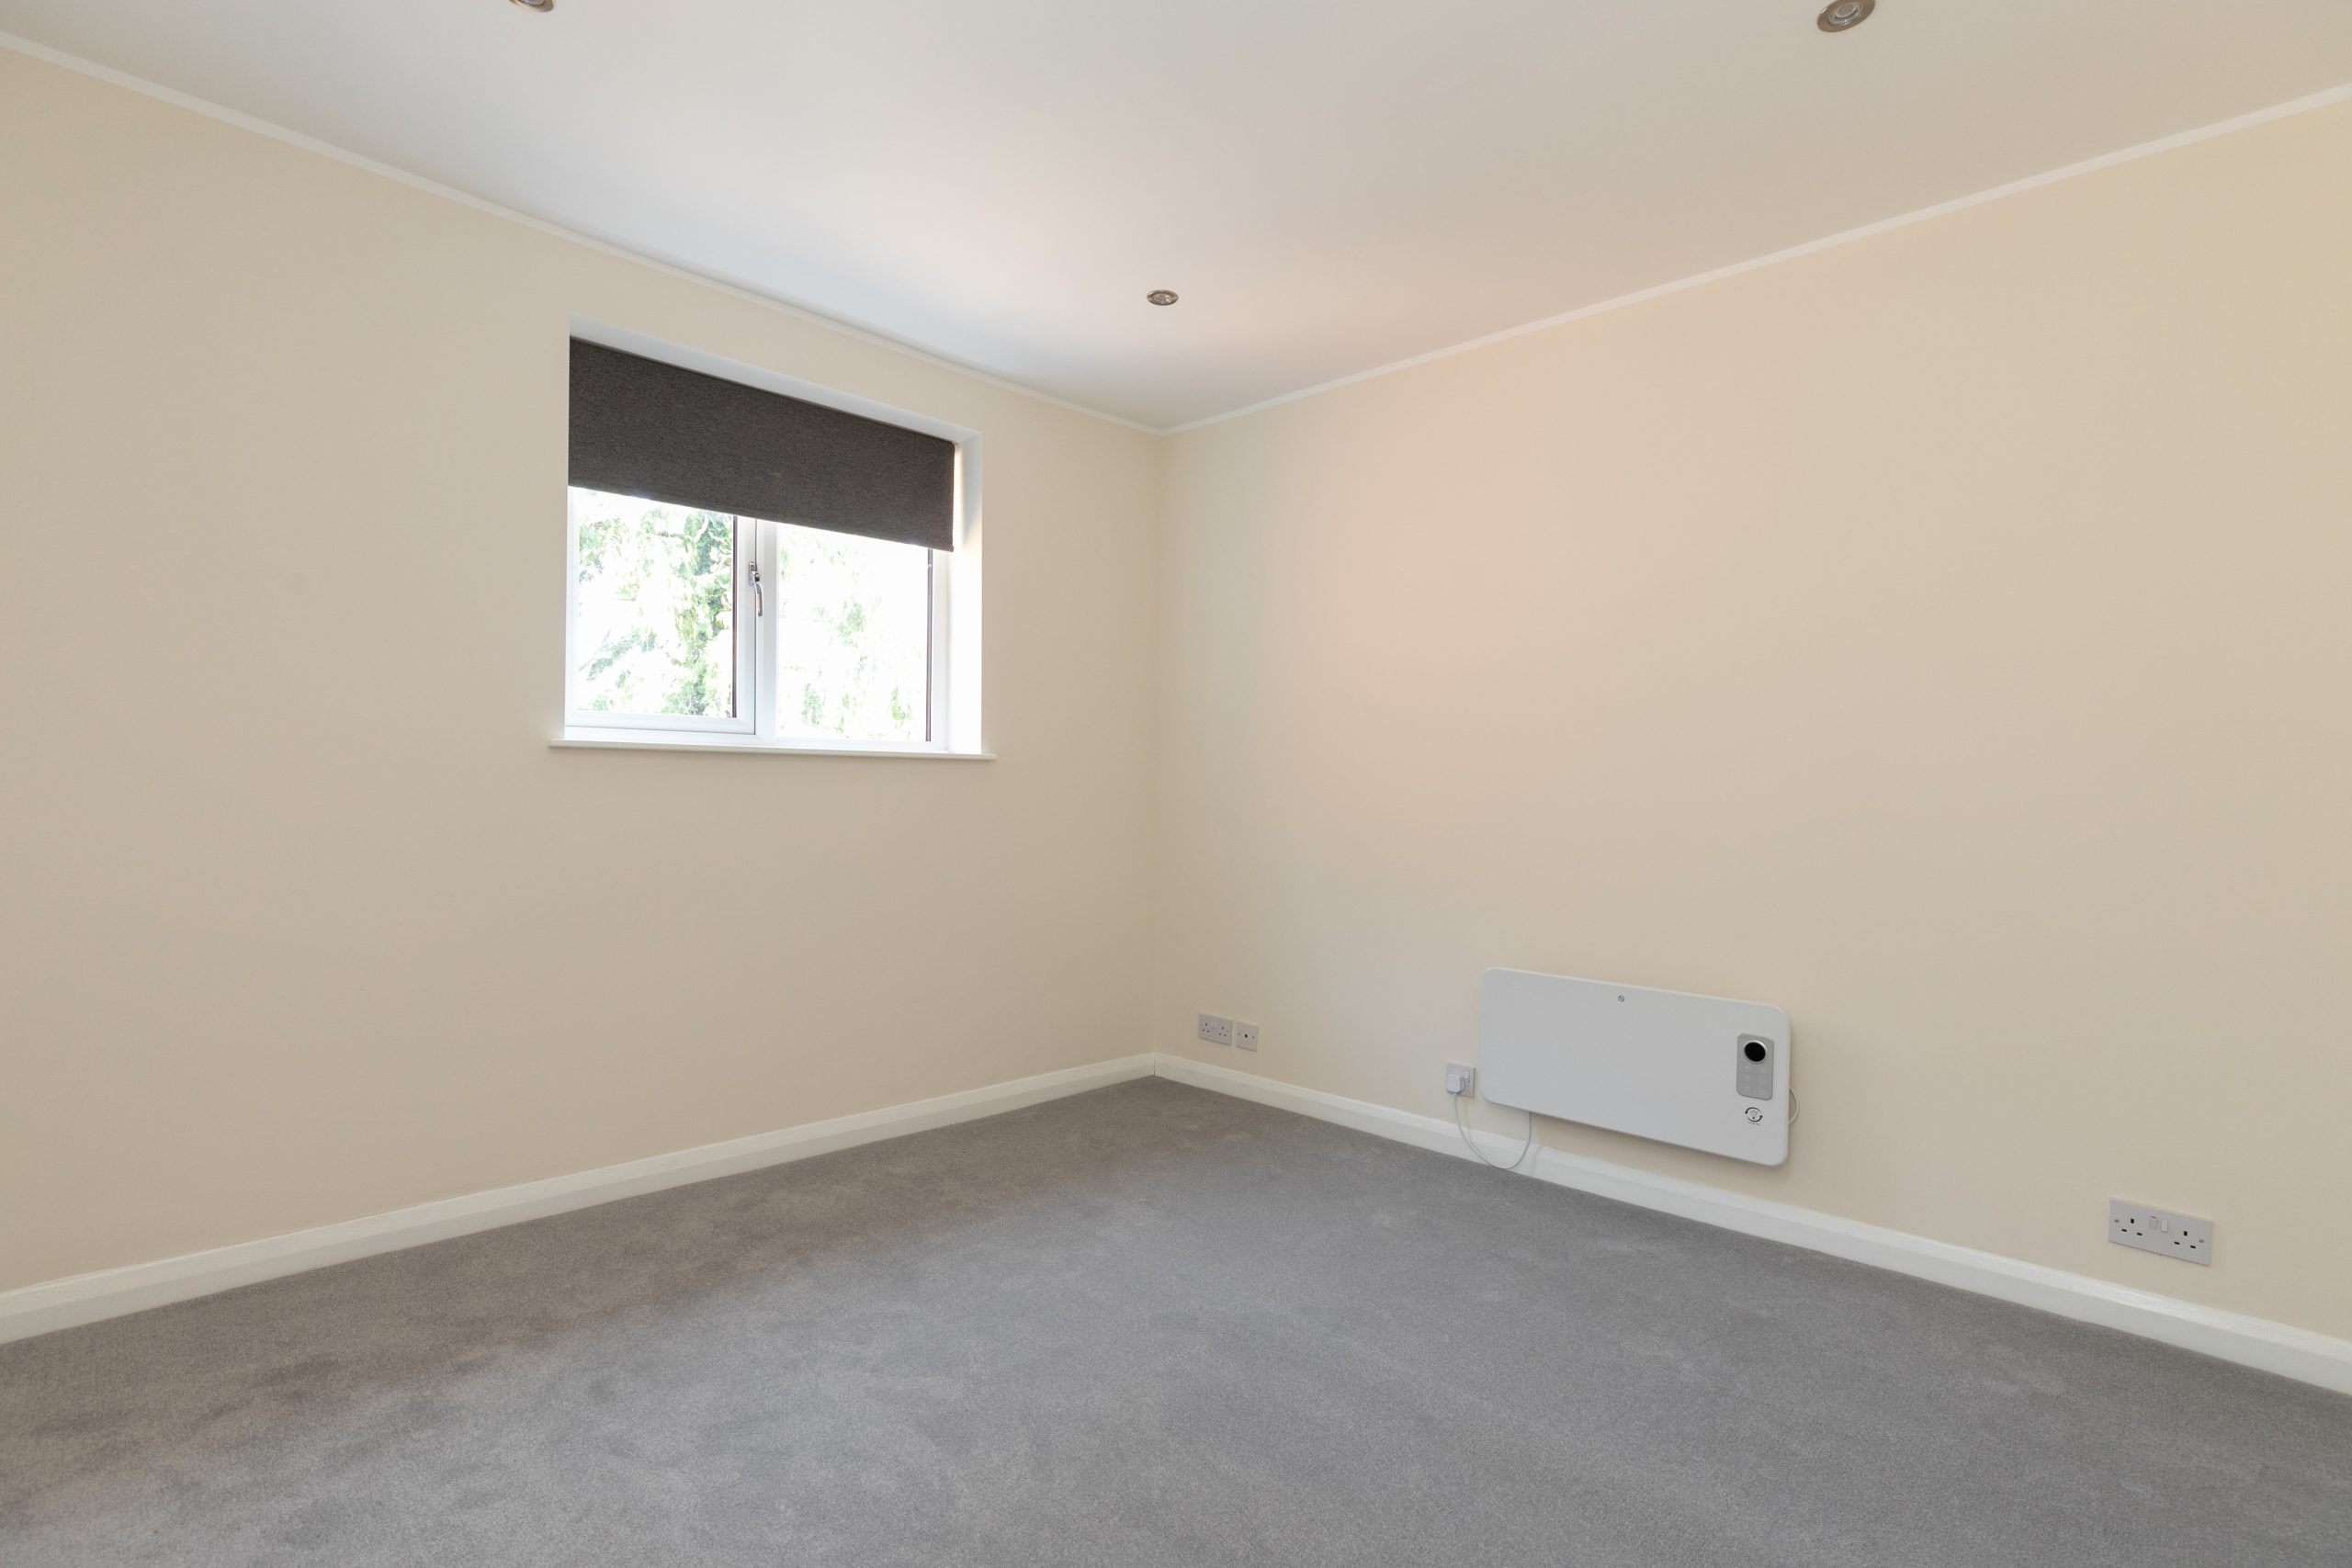 Rye – 2 Bedroom Detached House